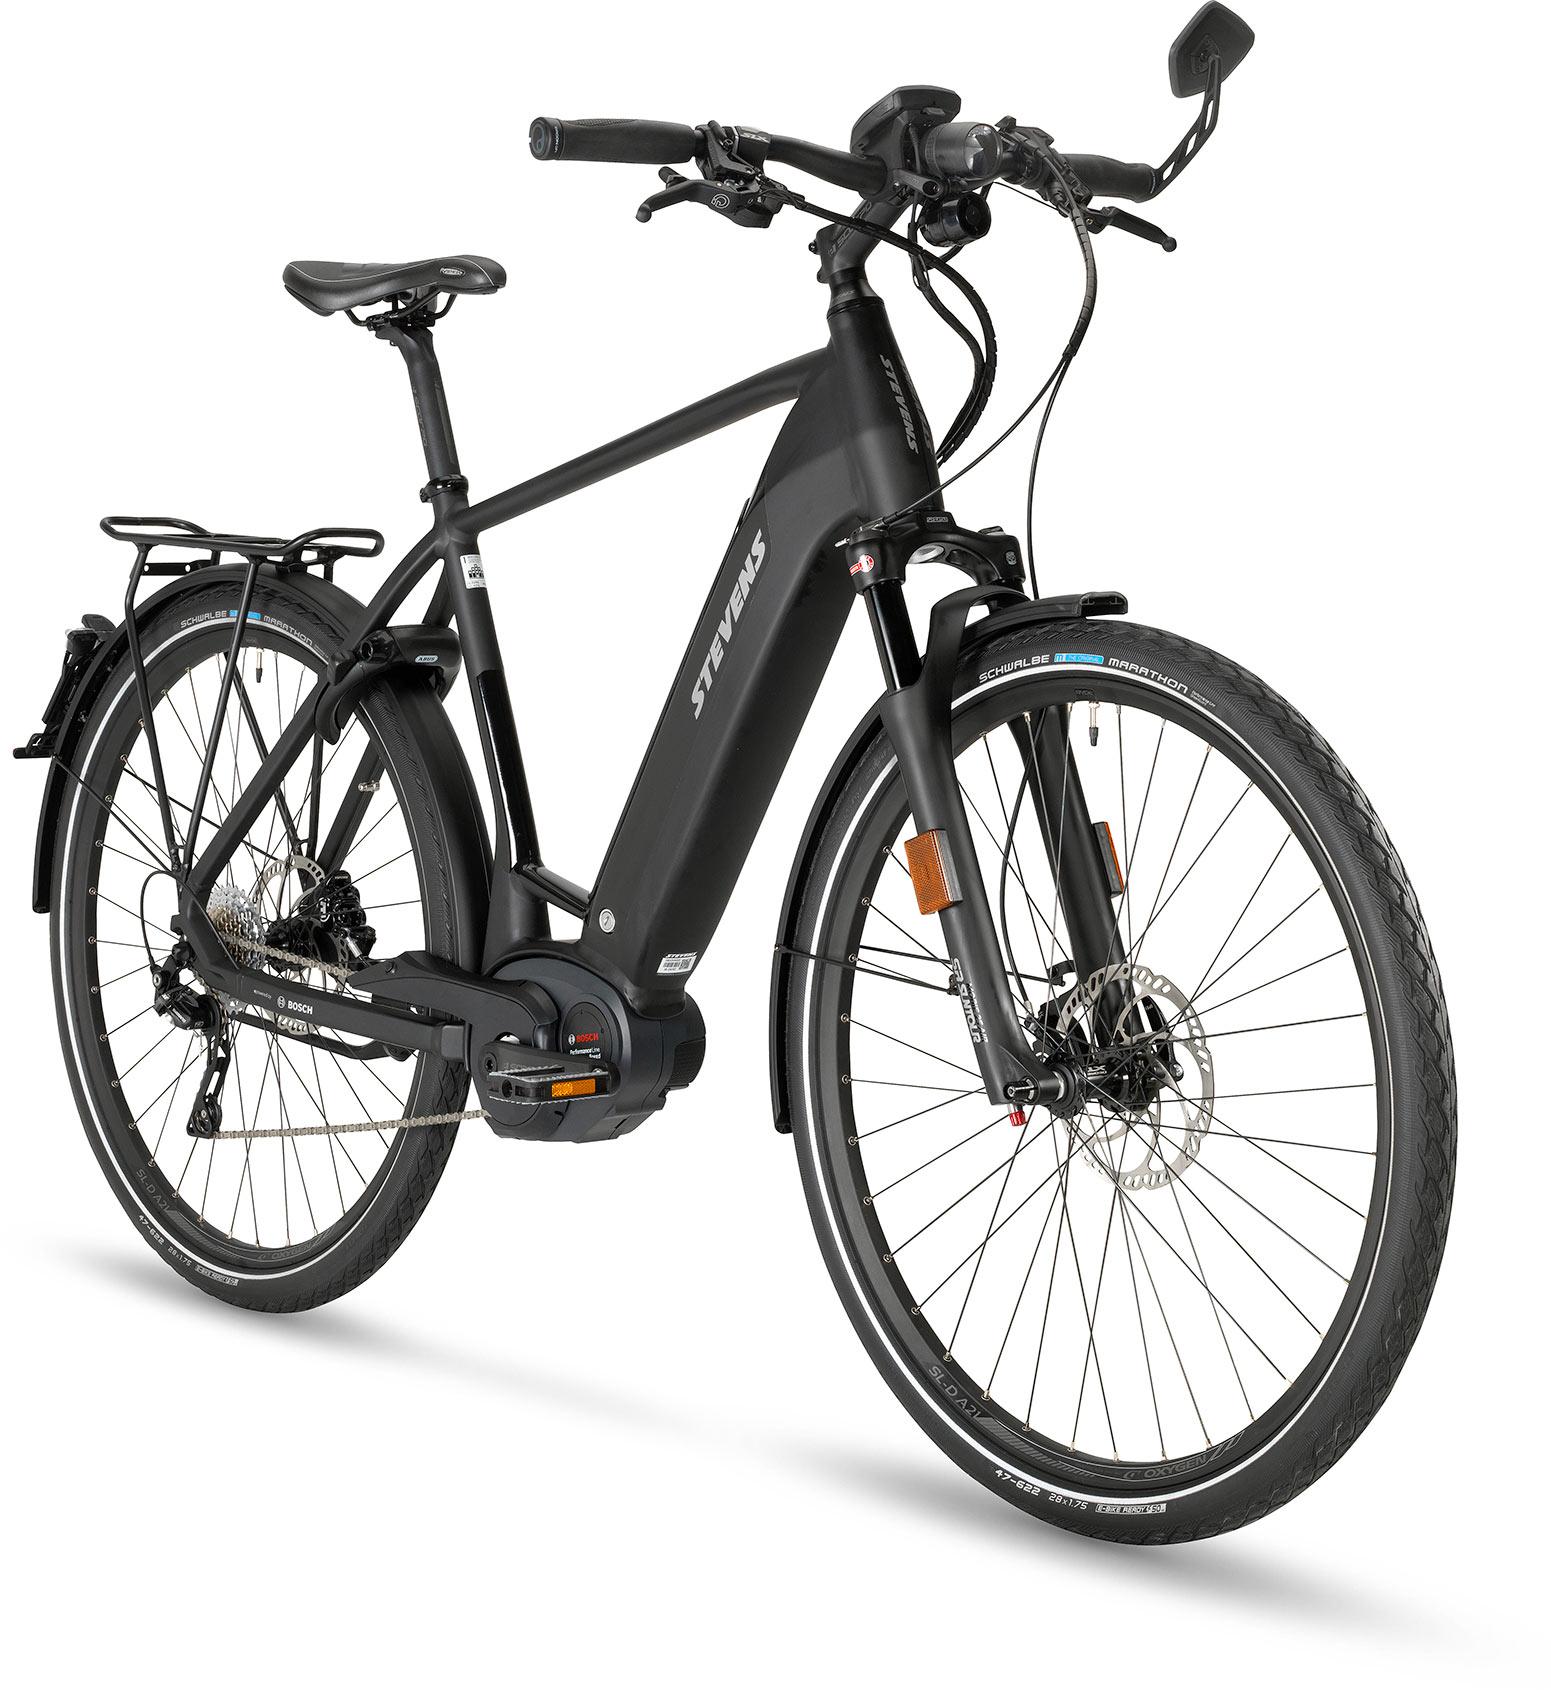 e triton 45 gent stevens bikes 2018. Black Bedroom Furniture Sets. Home Design Ideas